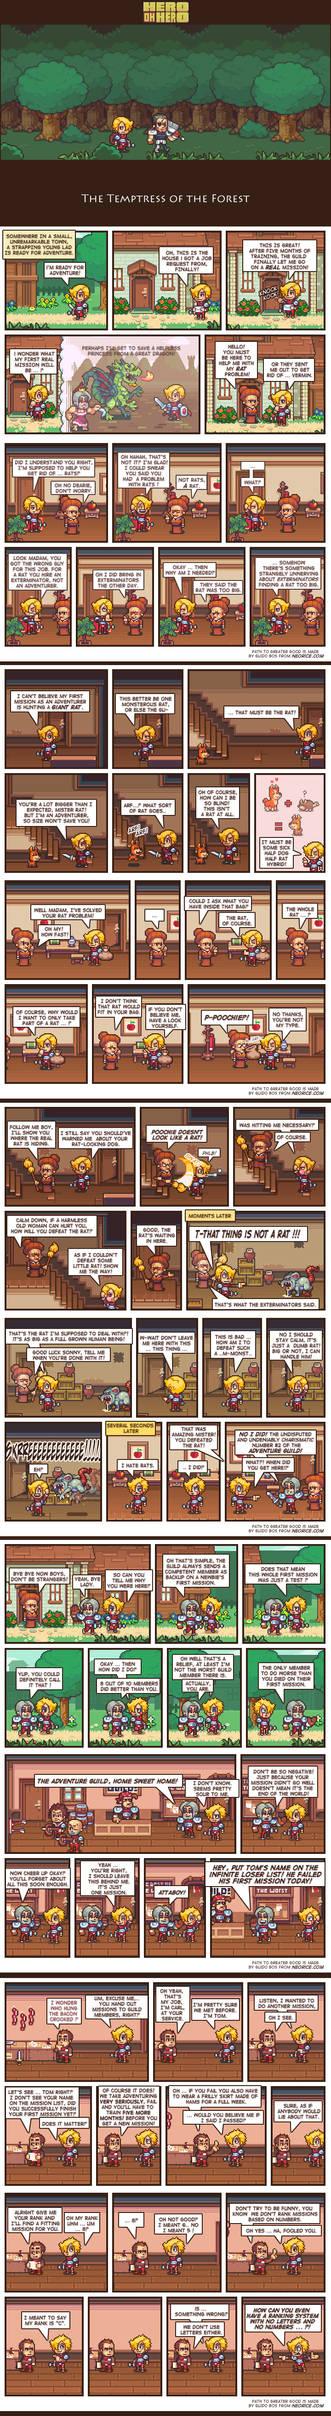 TOM RPG page 1-10